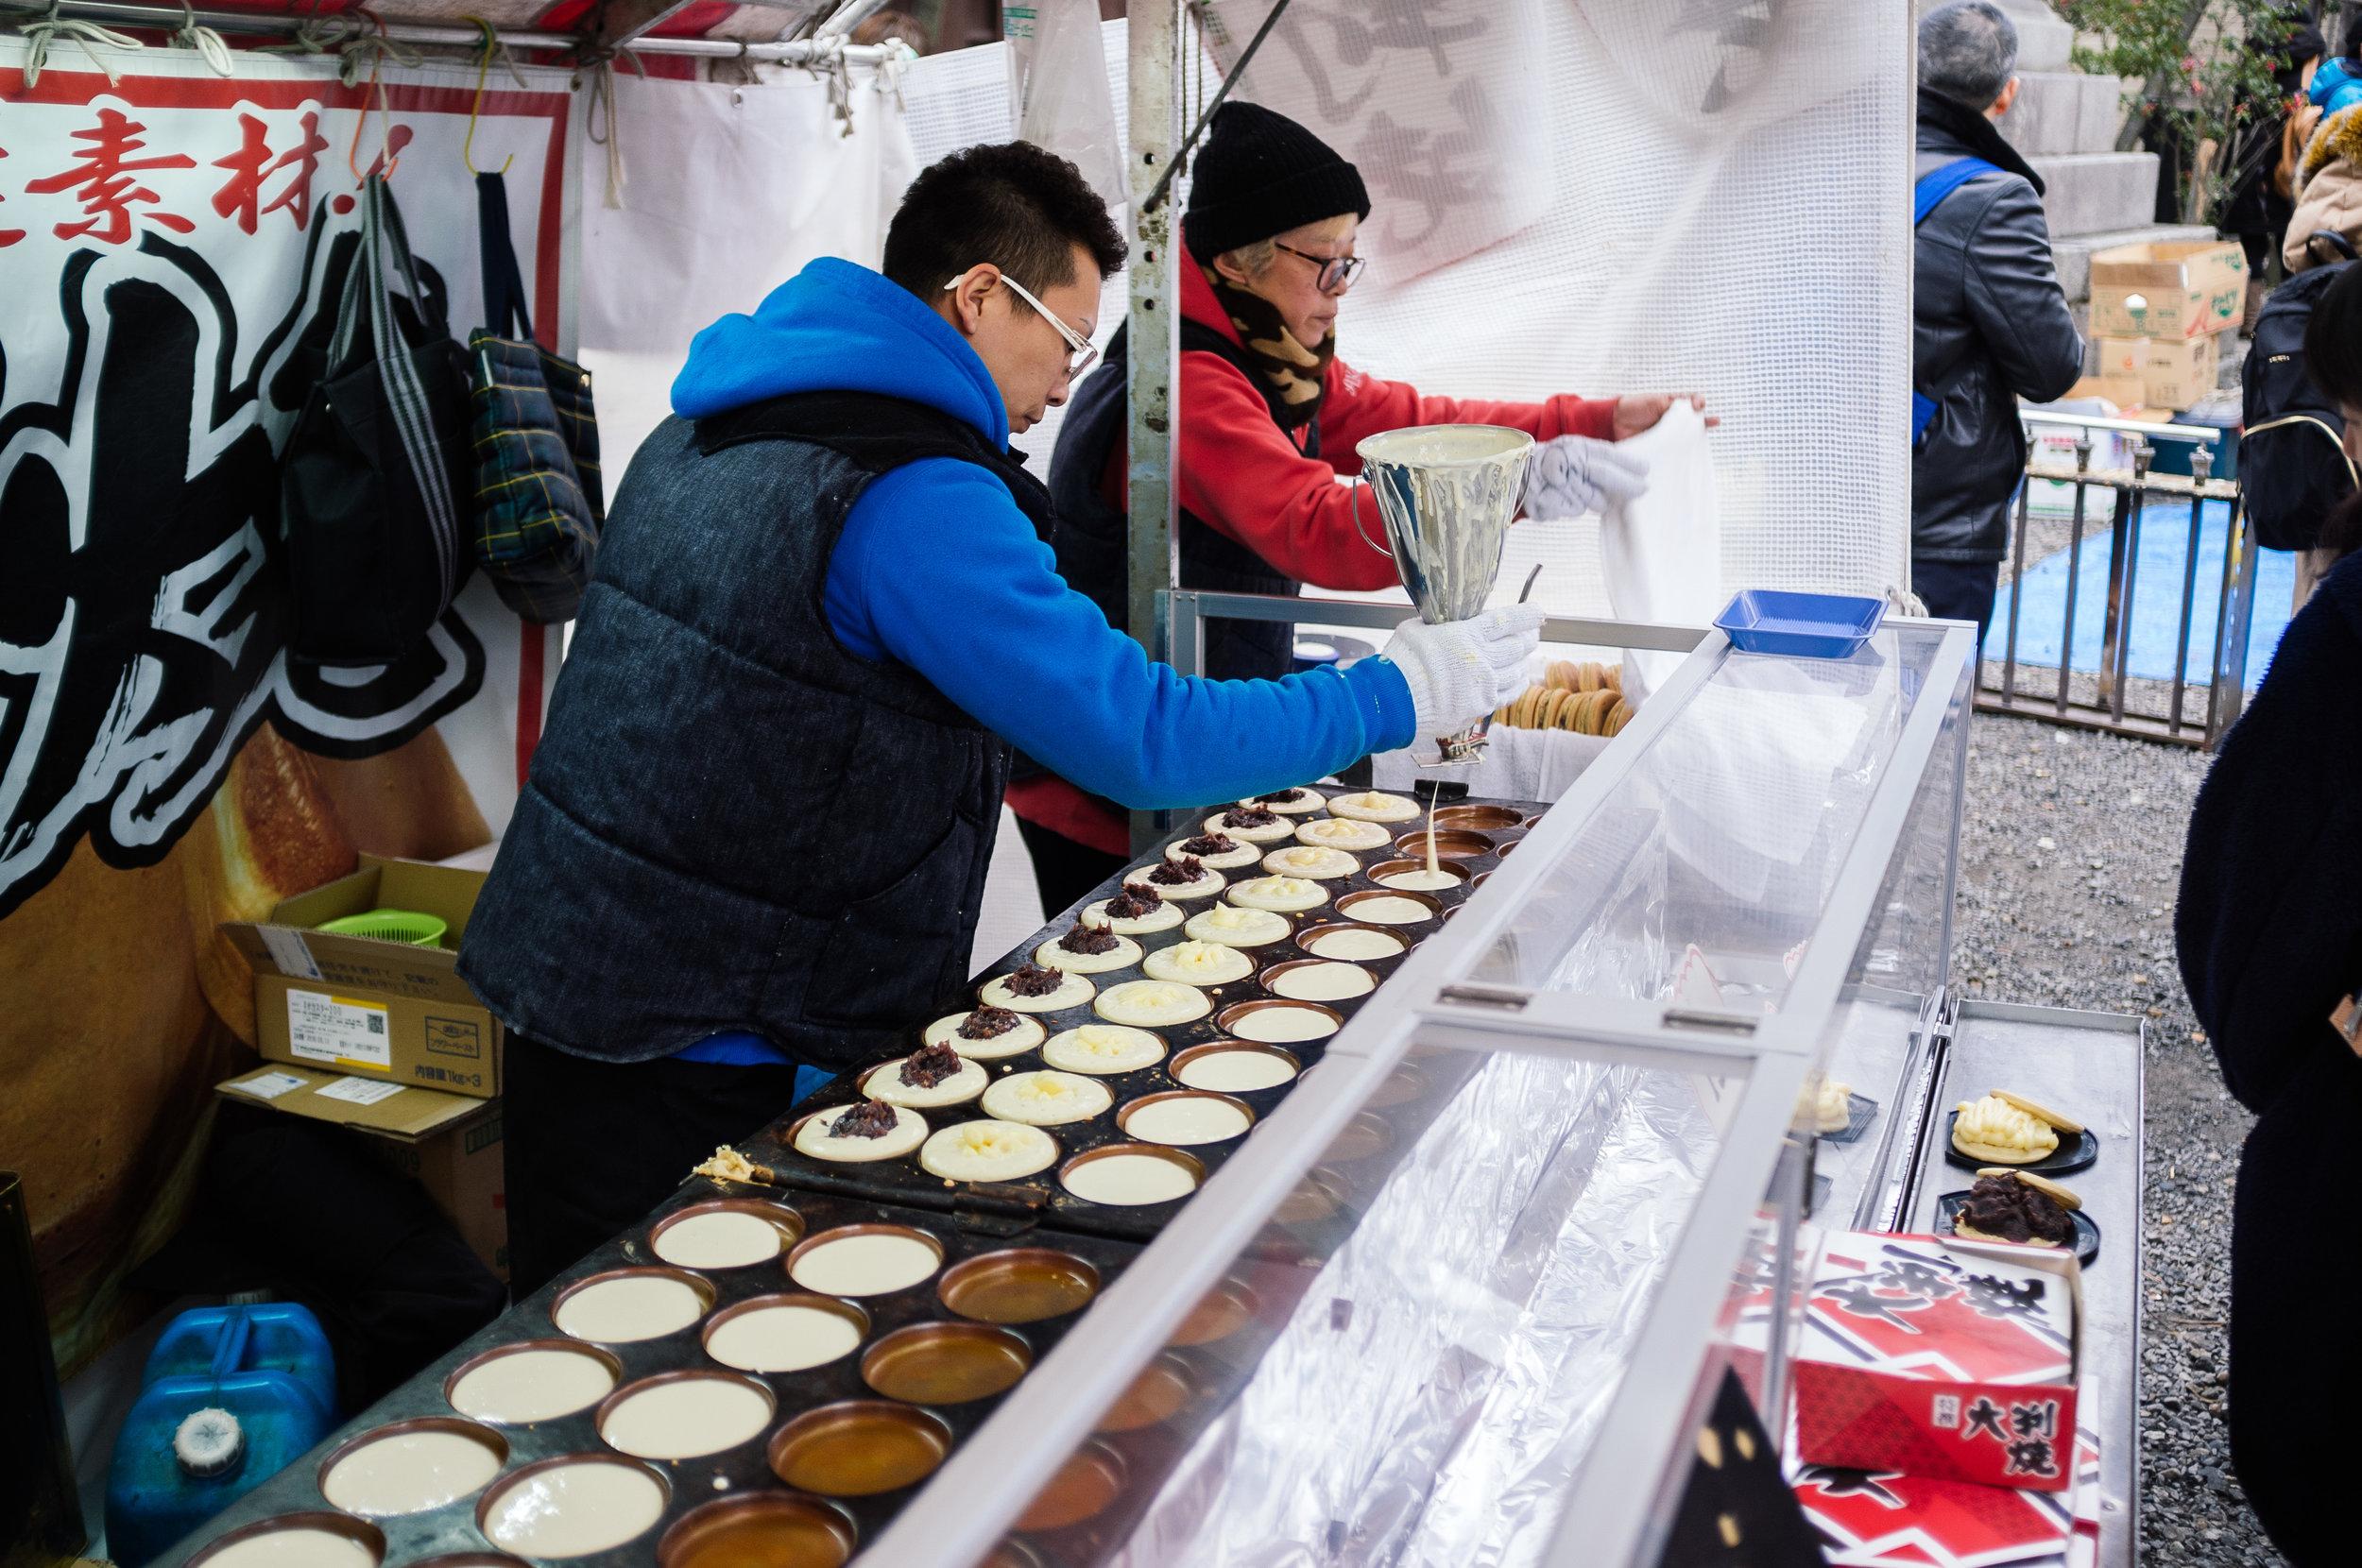 Kyoto Food Stall Cakes 1.jpg